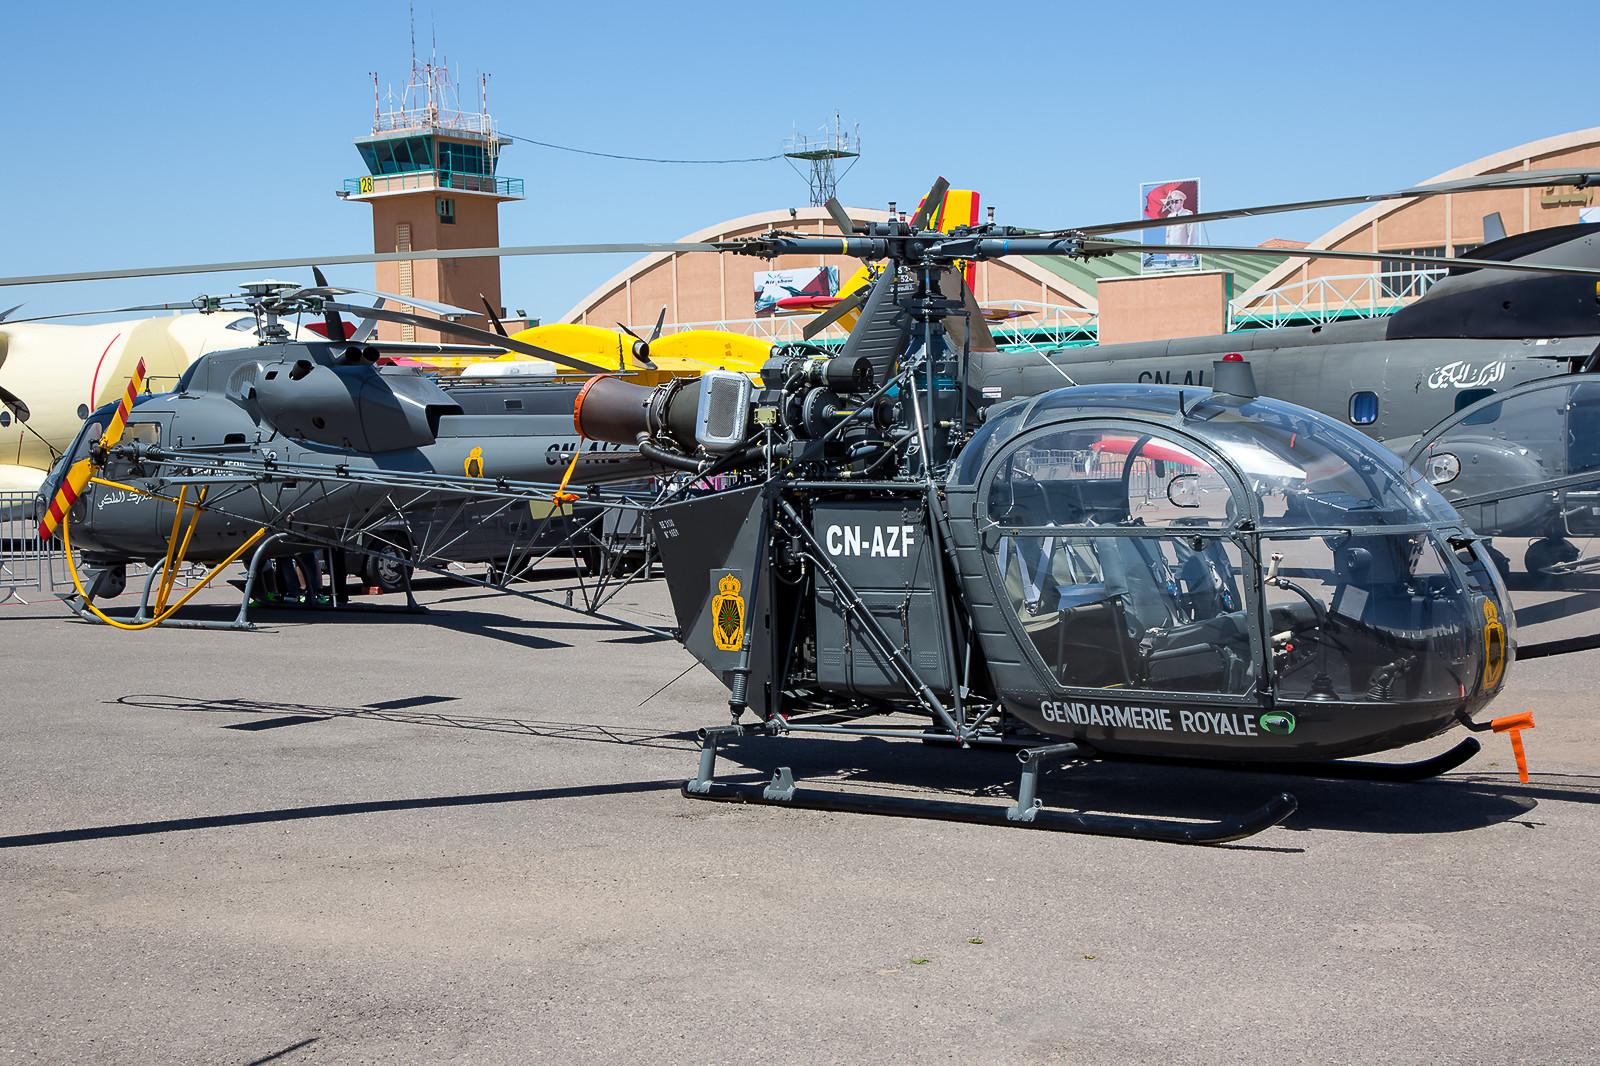 Ein echter Klassiker sind die Alouette II der Gendarmerie Royale